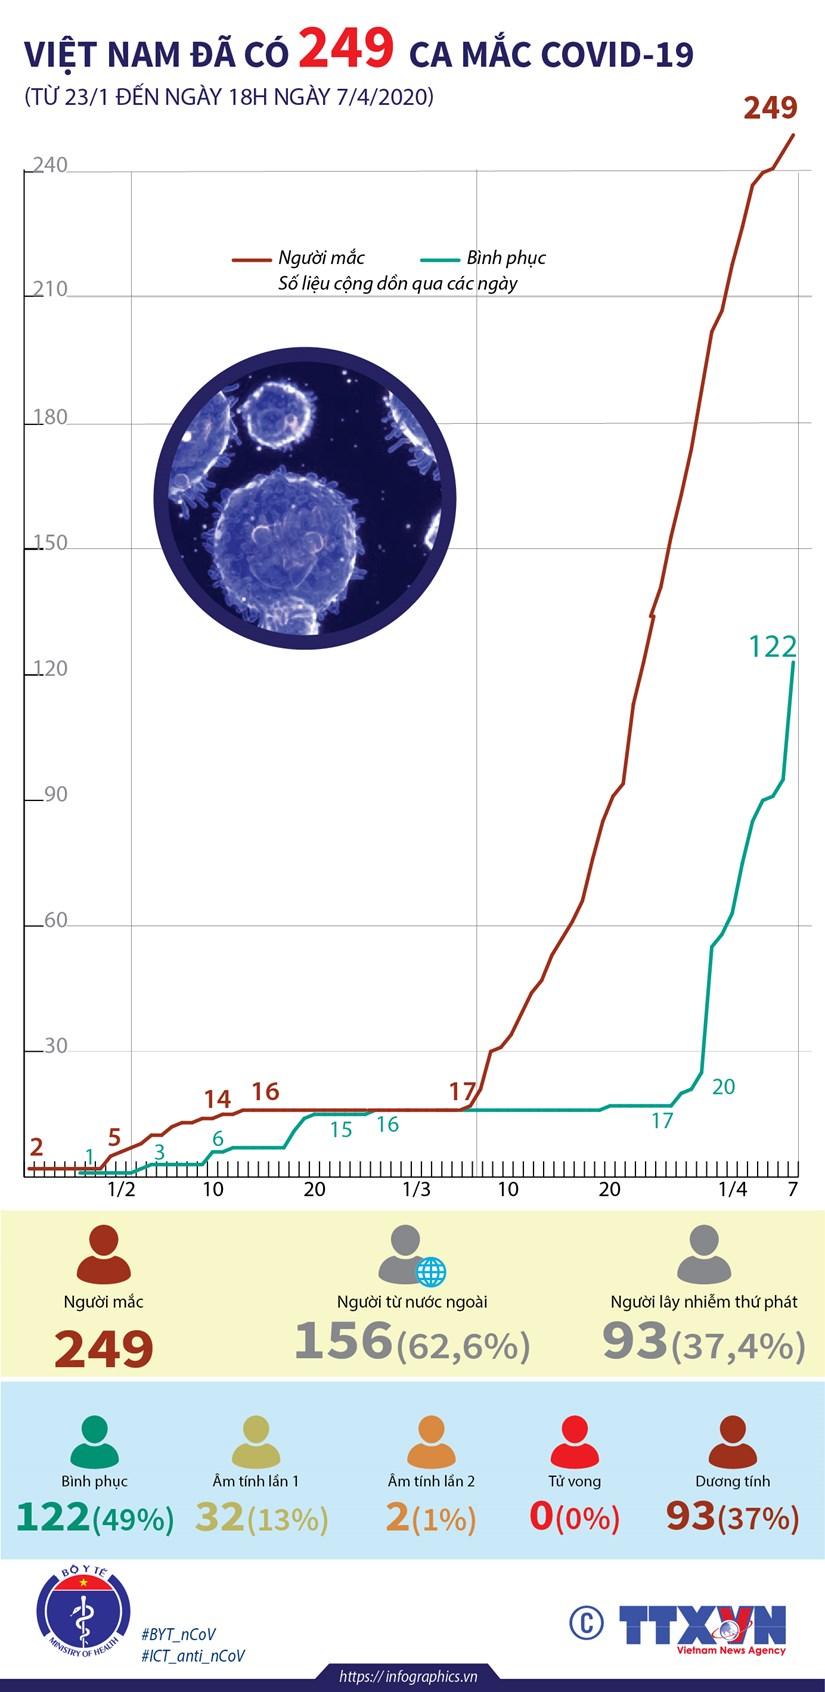 [Infographics] Viet Nam da ghi nhan 249 ca mac COVID-19 hinh anh 1